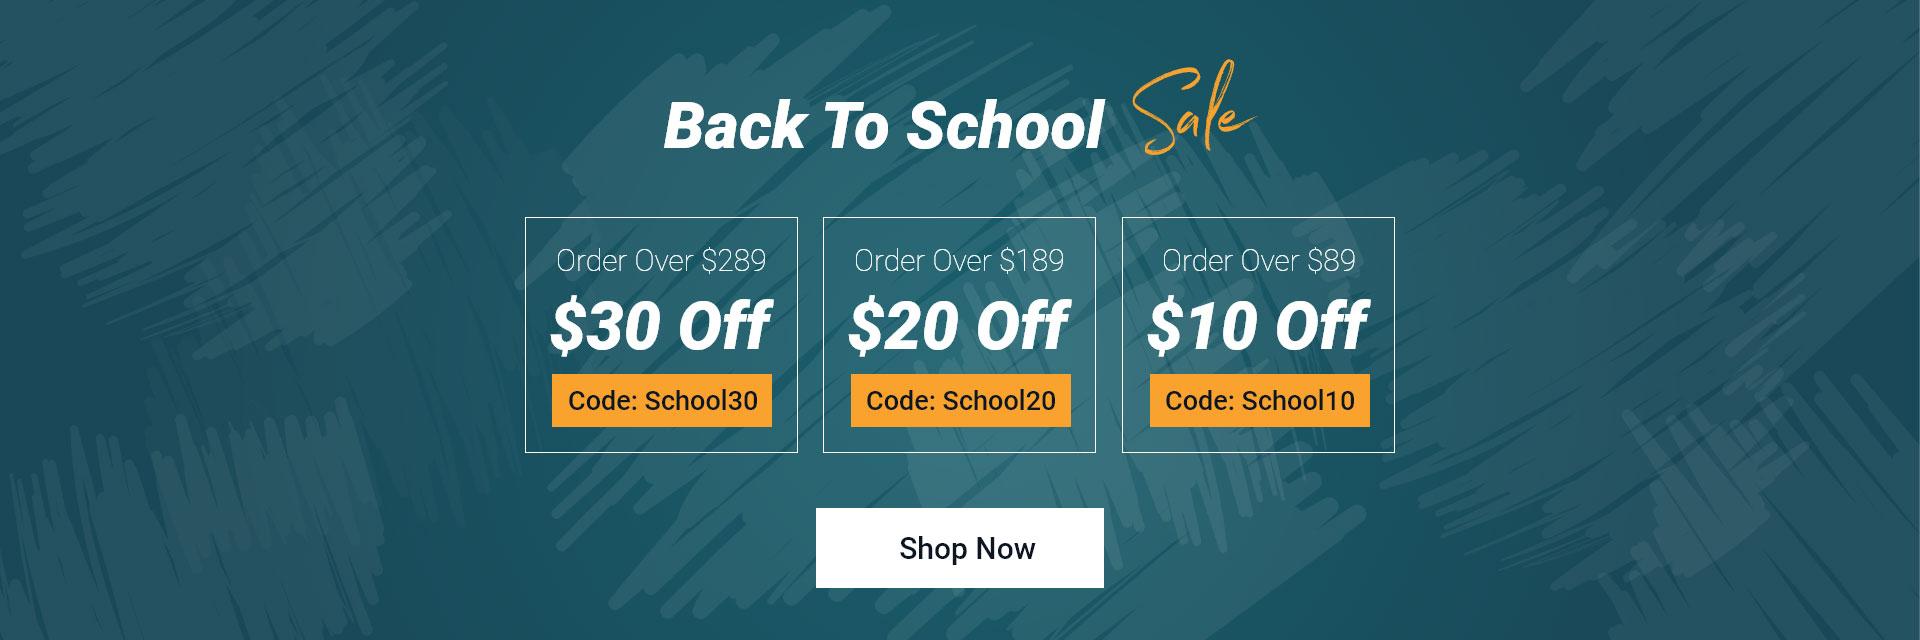 Back To School Sale 2021 PC1